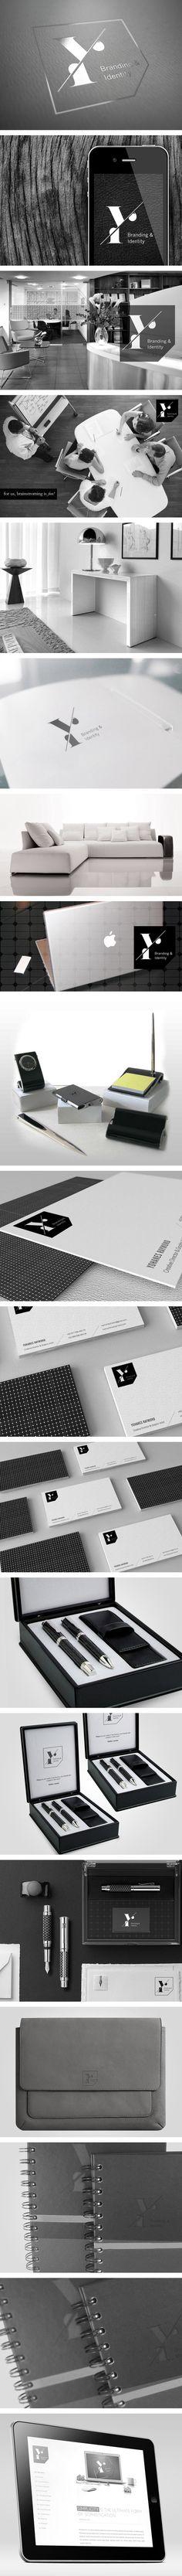 YR STUDIO Inc. by Yohanes Raymond